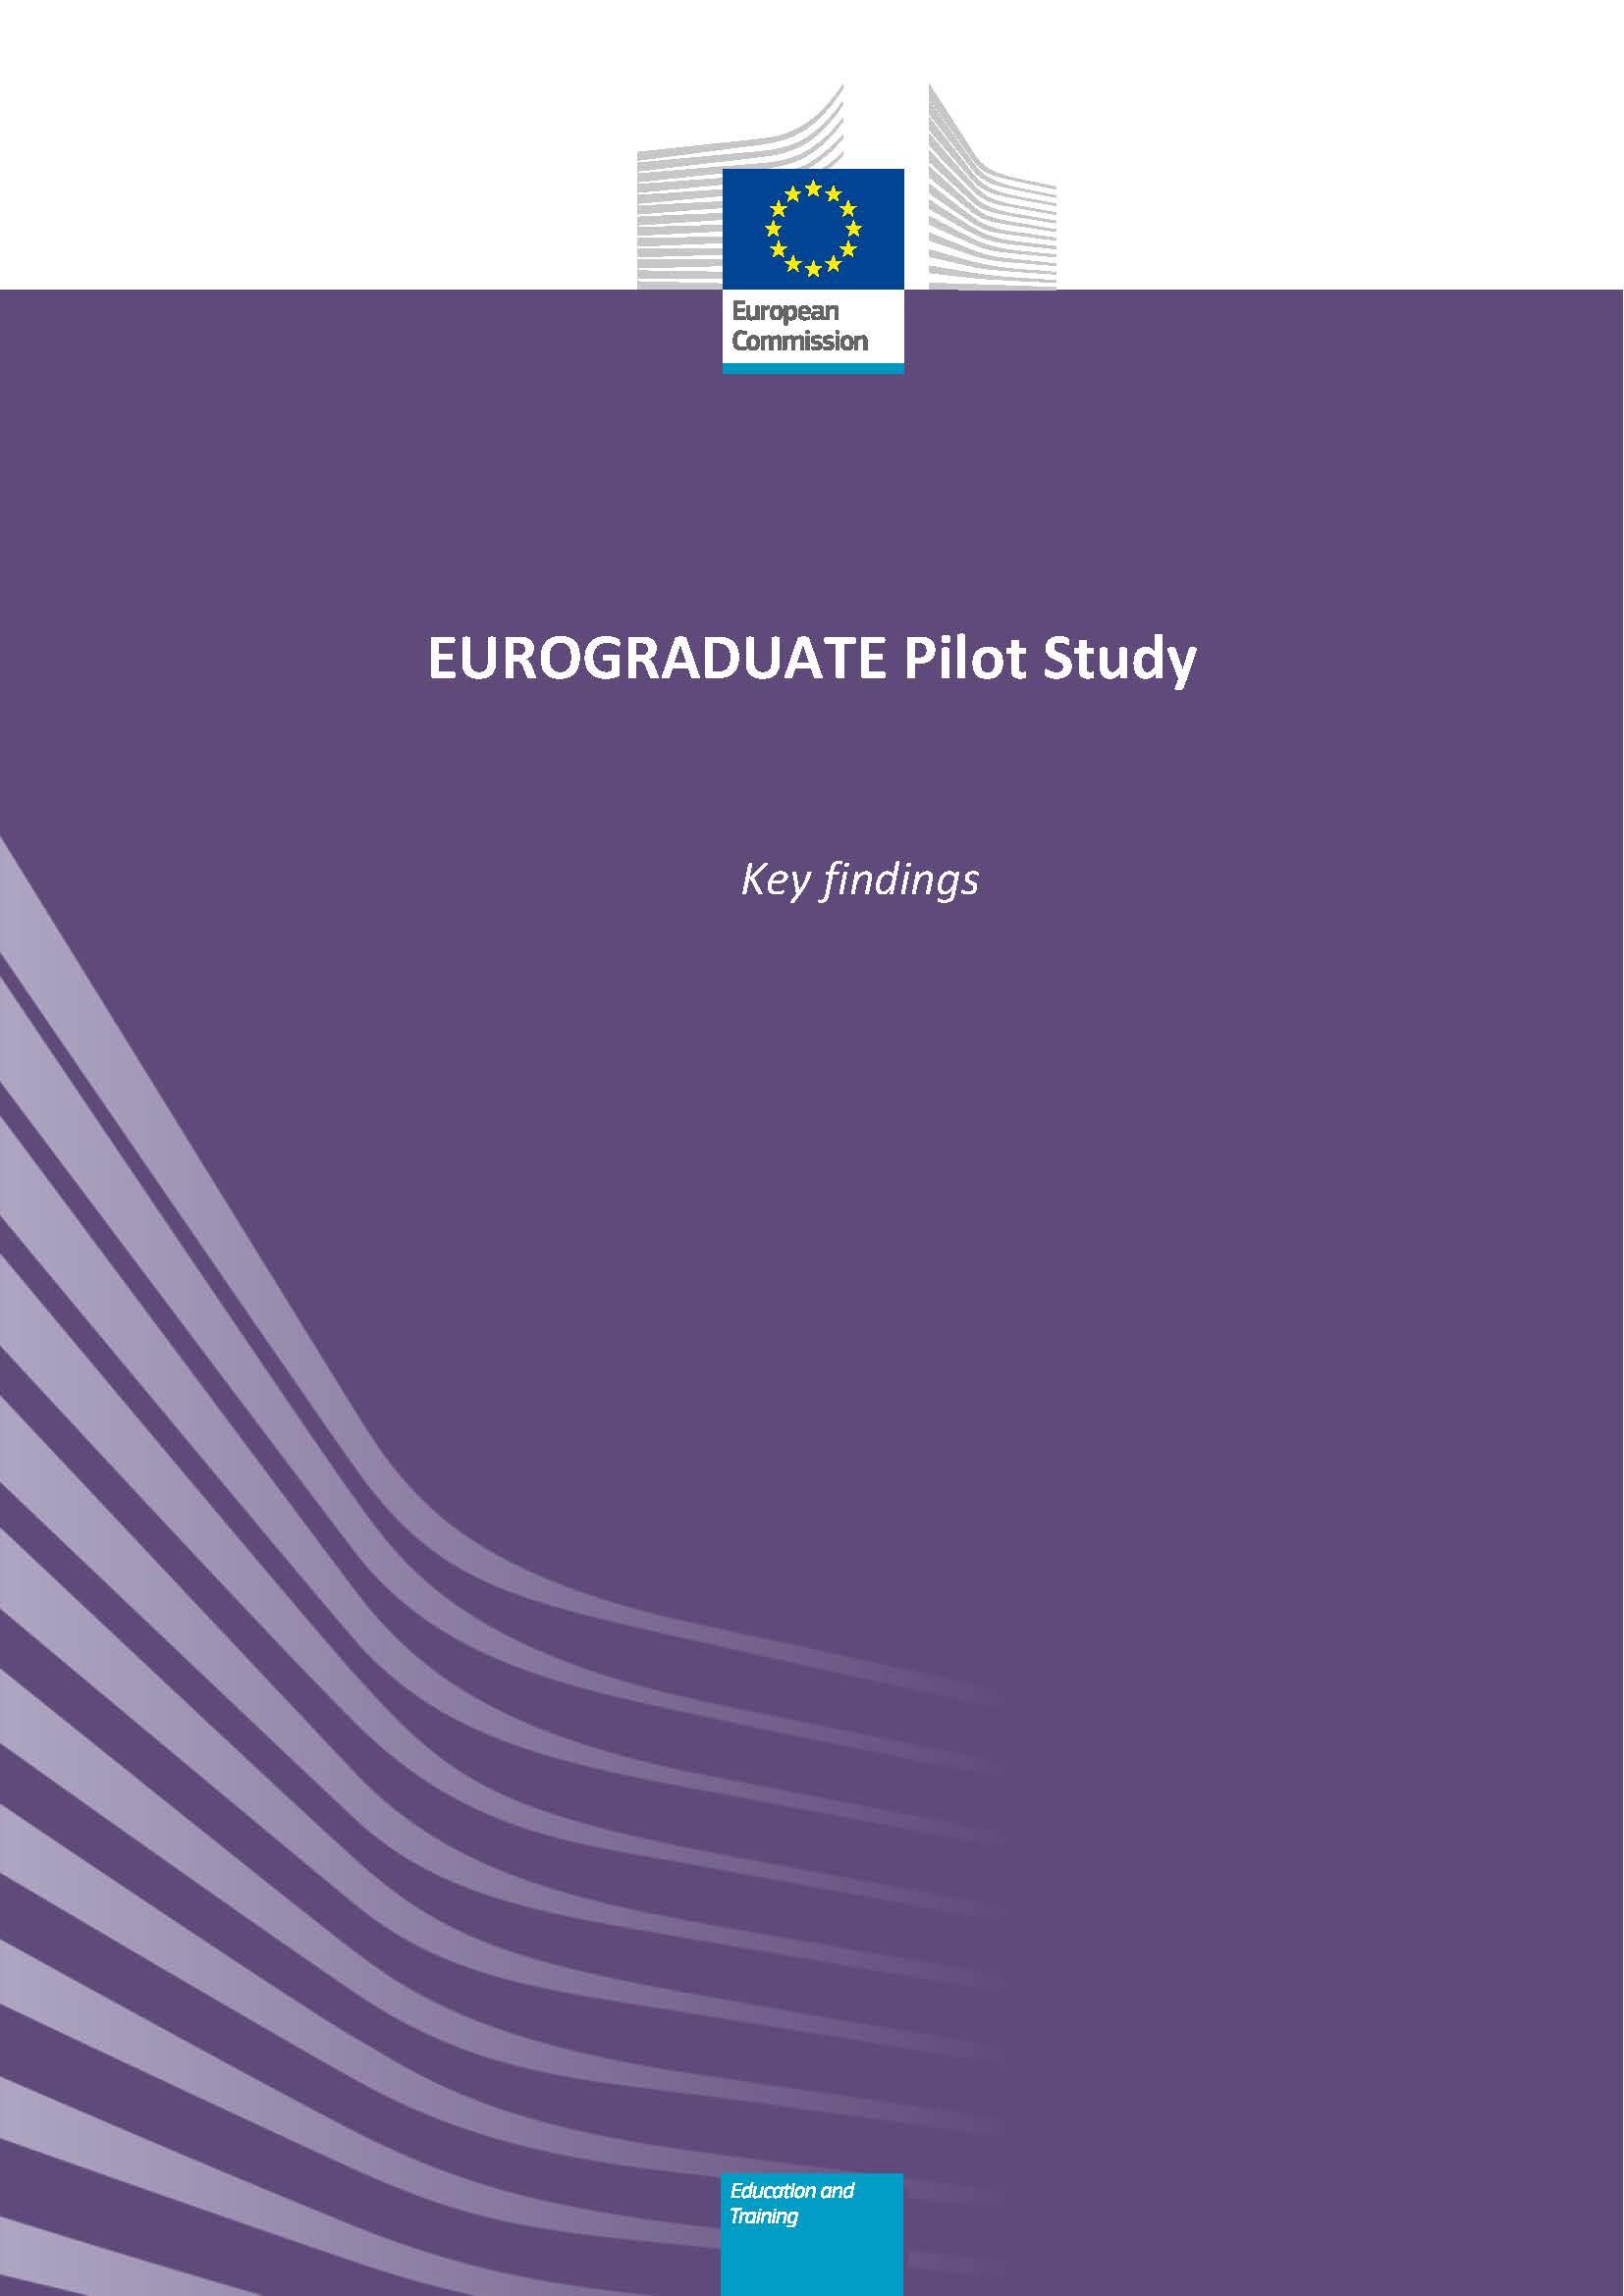 Eurograduate pilot study: key findings